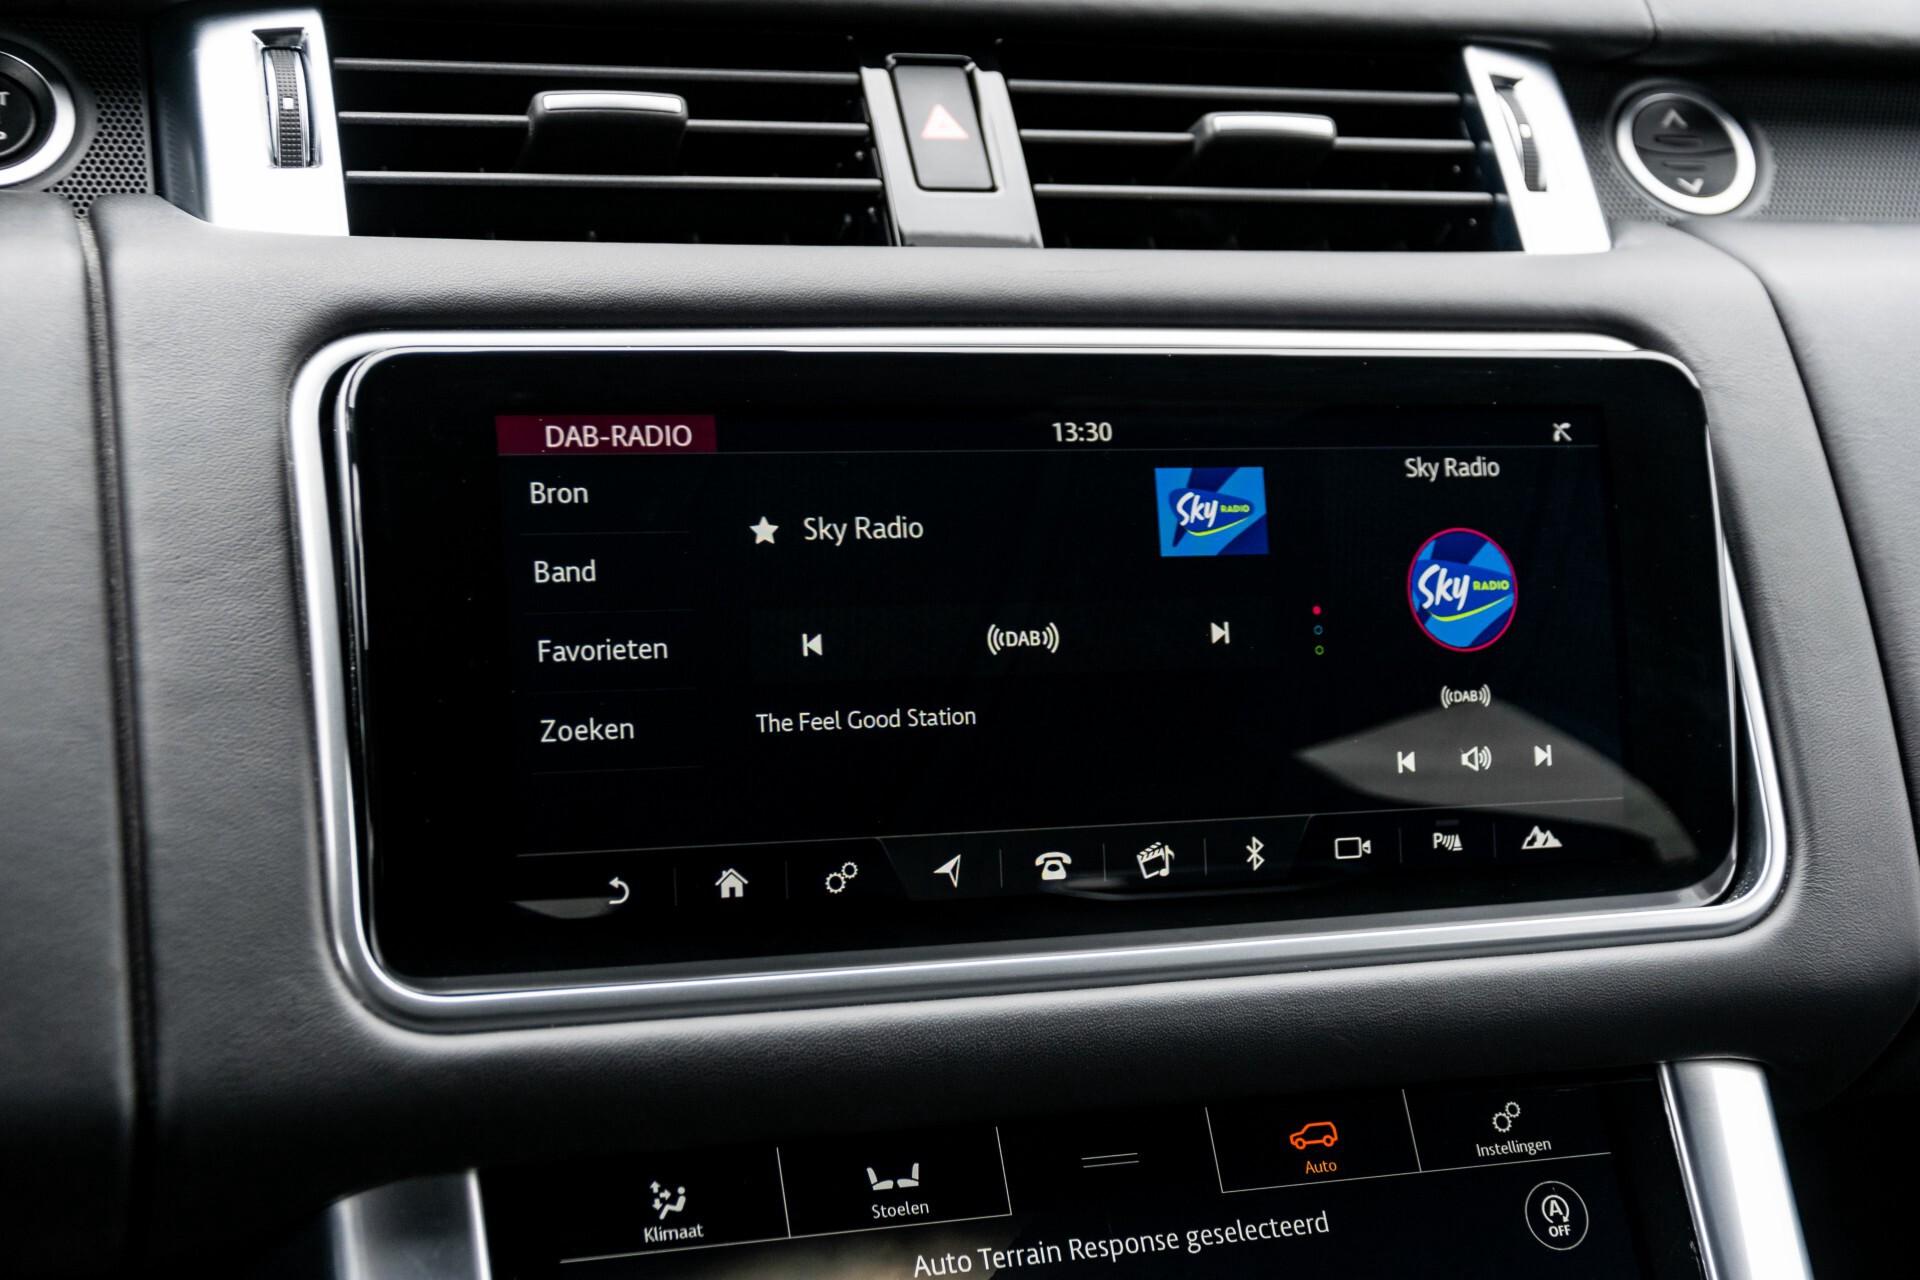 Land Rover Range Rover Sport SVR 5.0 Supercharged 575pk Full Carbon Nieuwprijs €241377 Foto 16